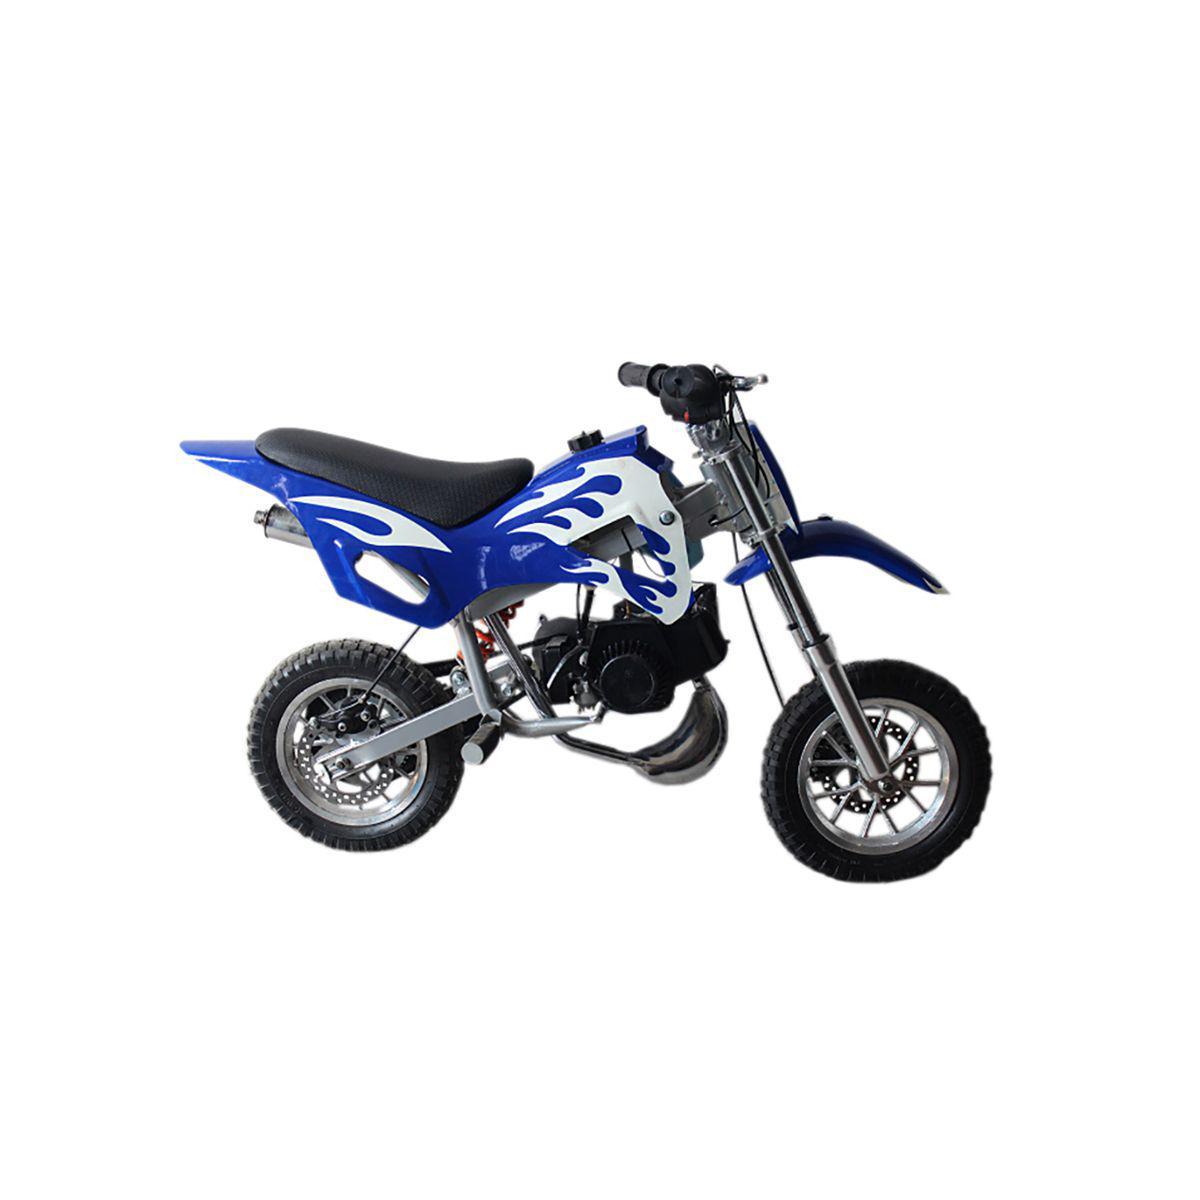 Mini Moto Cross 49cc Dirt Bike A Gasolina 2 Tempos Wvdb 006 Azul Importway Mini Moto Motorizada Magazine Luiza